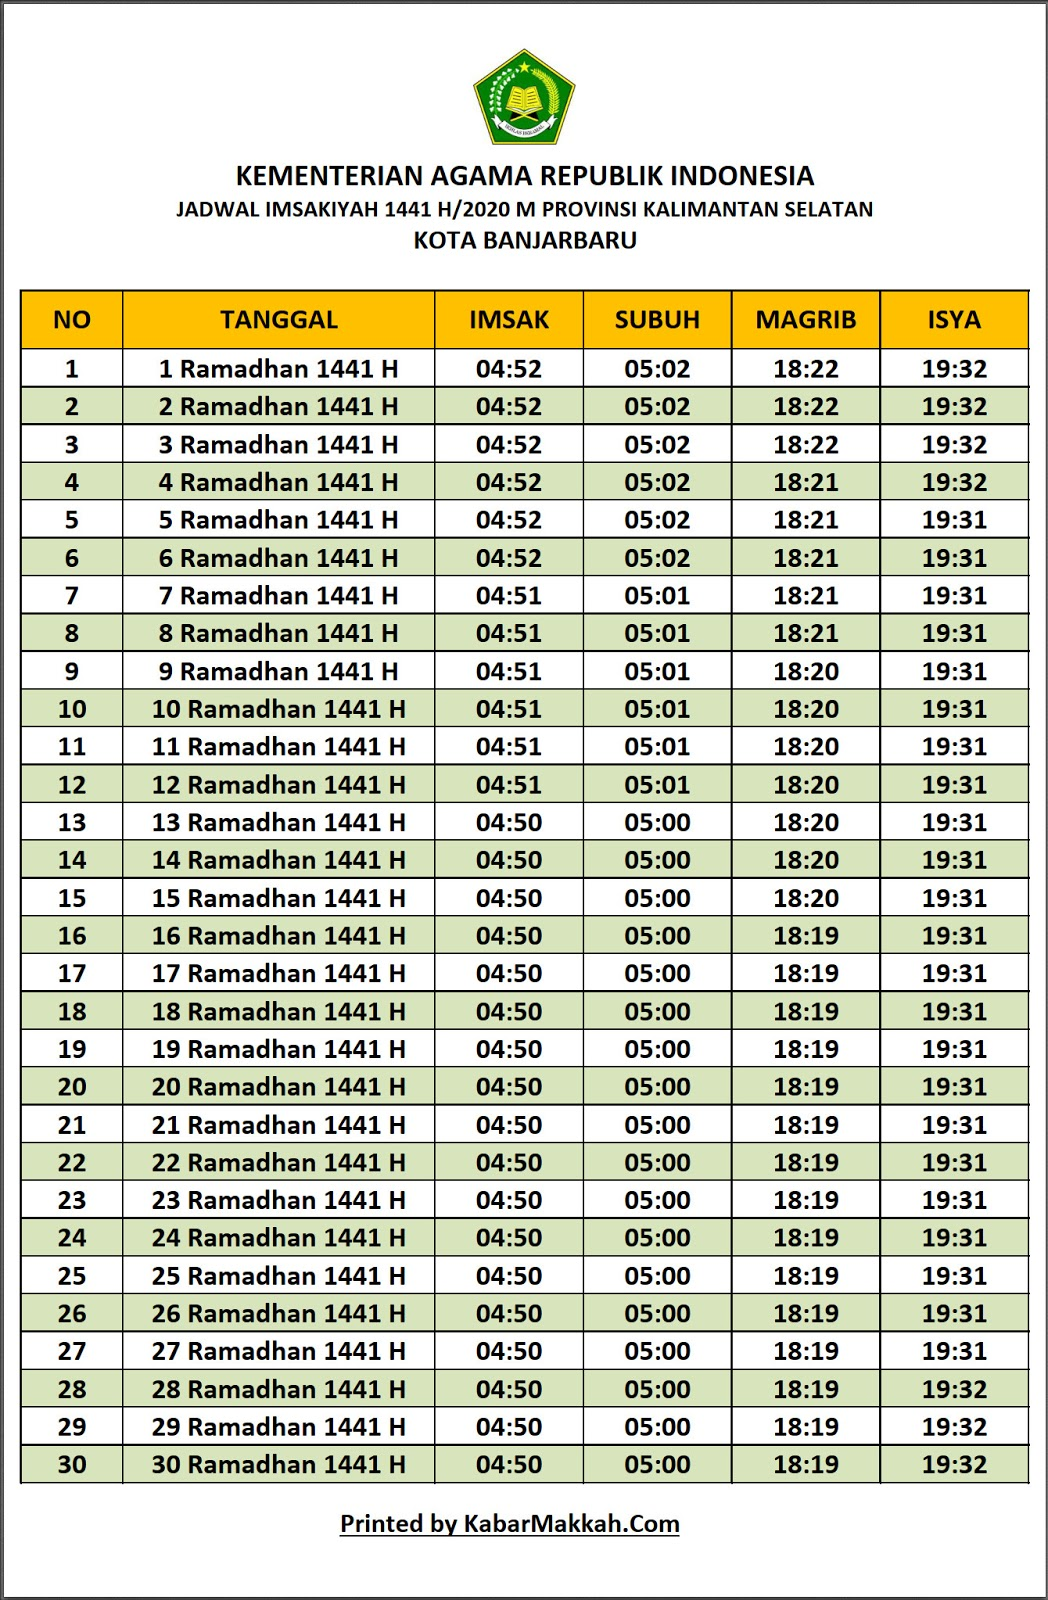 Jadwal Imsakiyah Banjarbaru 2020